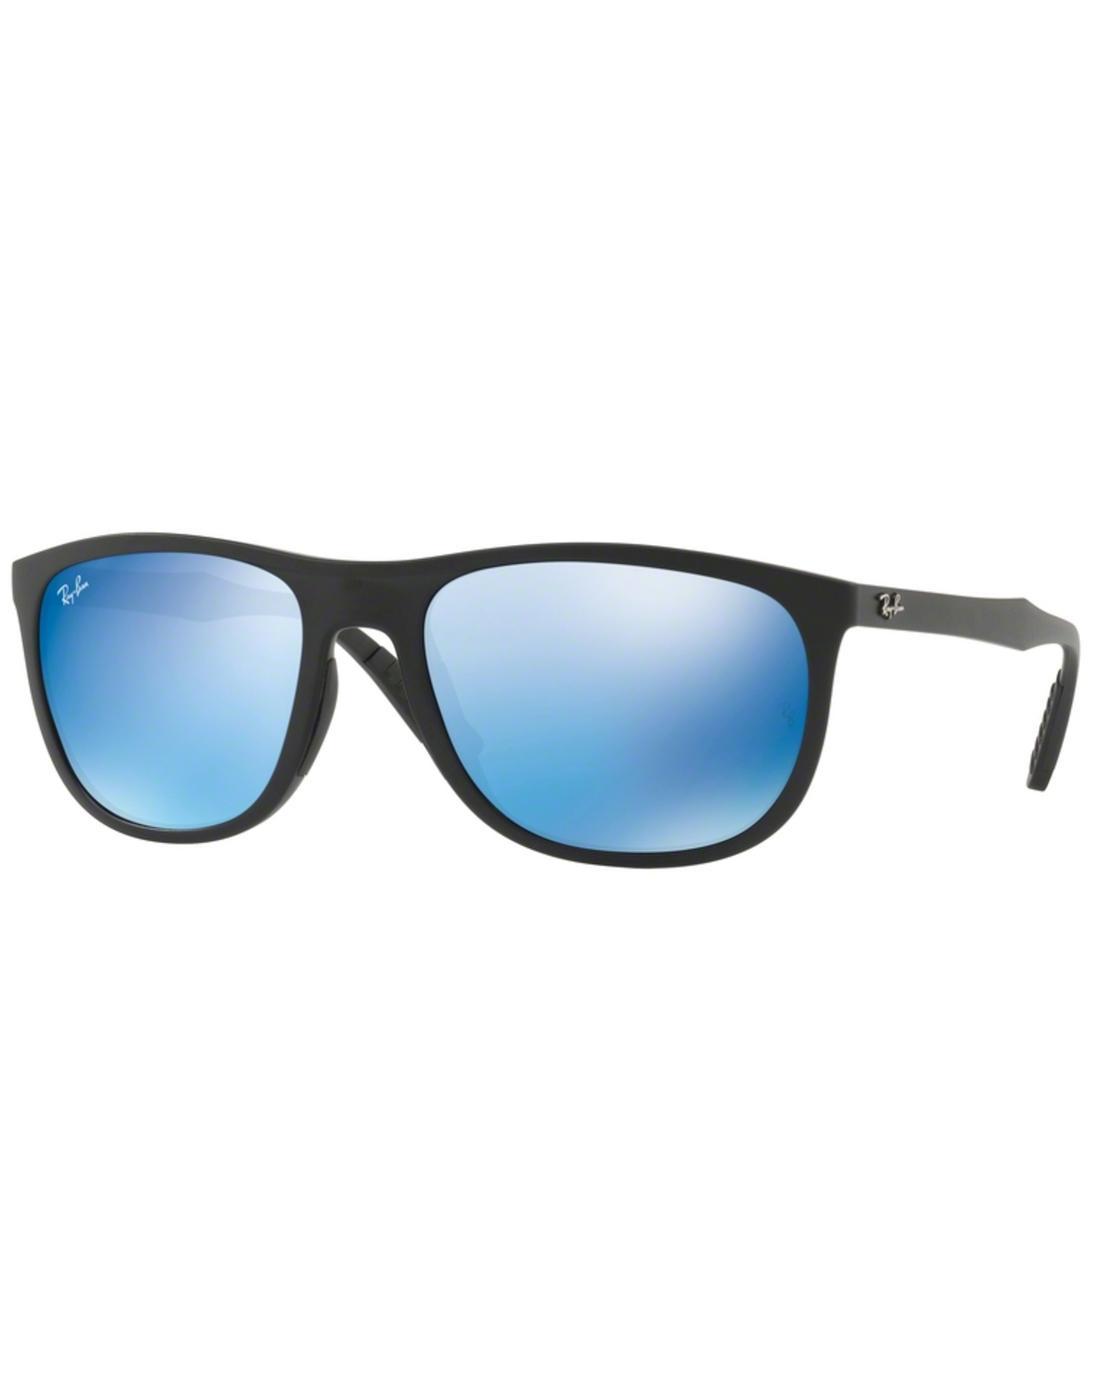 RAY-BAN Retro Wrap Around Wayfarer Sunglasses Blue